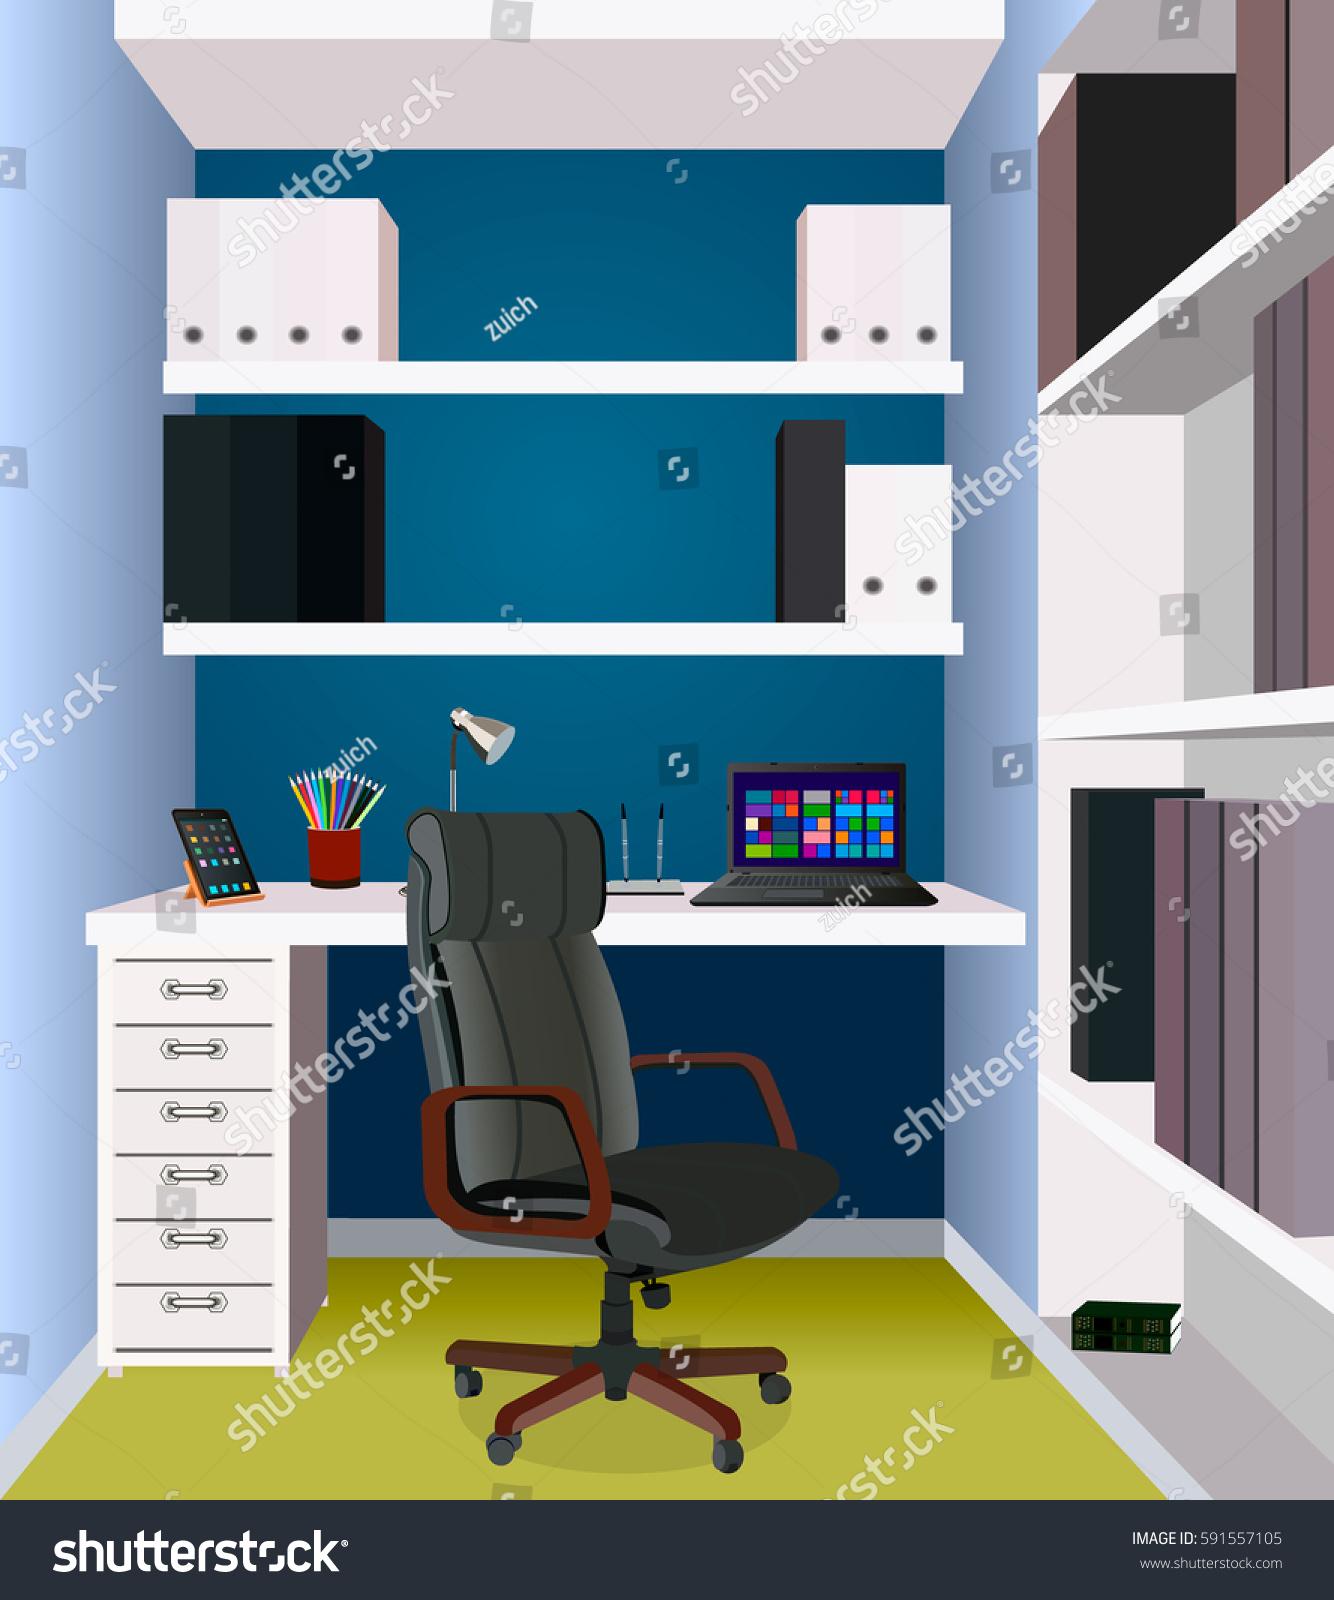 Interior Designer Working: Interior Design Work Space Workplace Office Stock Vector